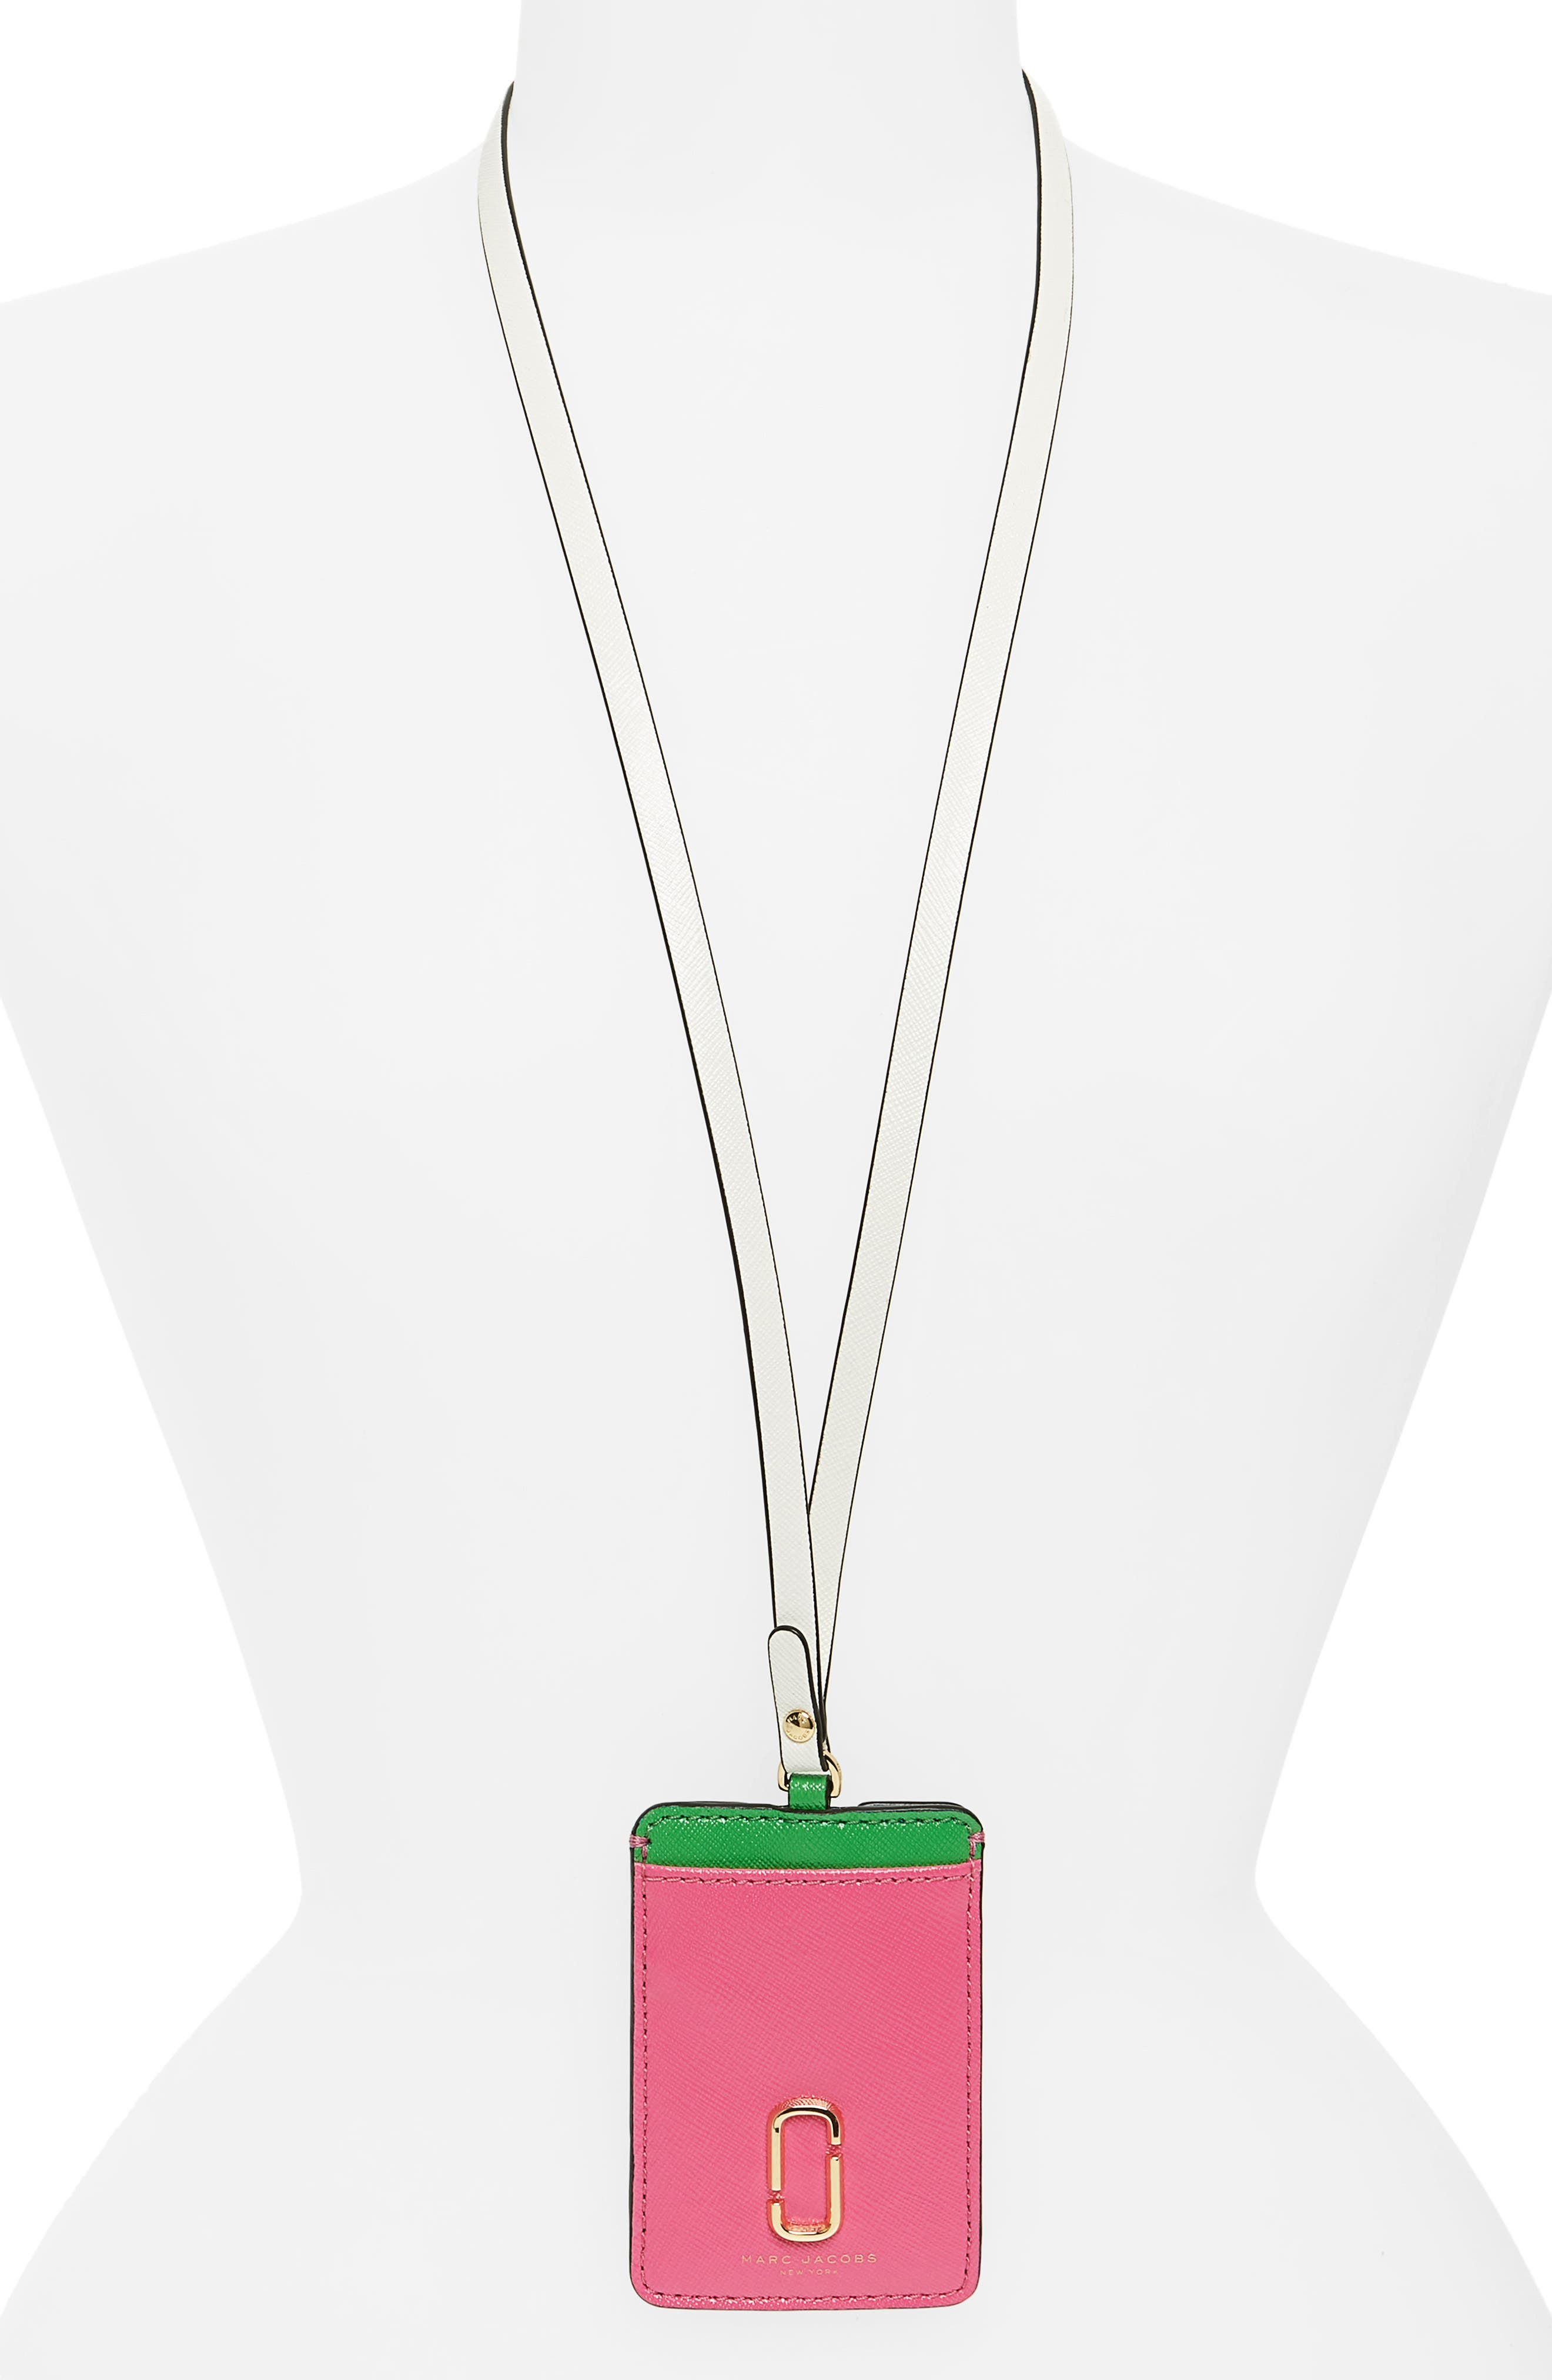 Snapshot Long Strap Leather Commuter Card Case,                             Main thumbnail 1, color,                             Vivid Pink Multi